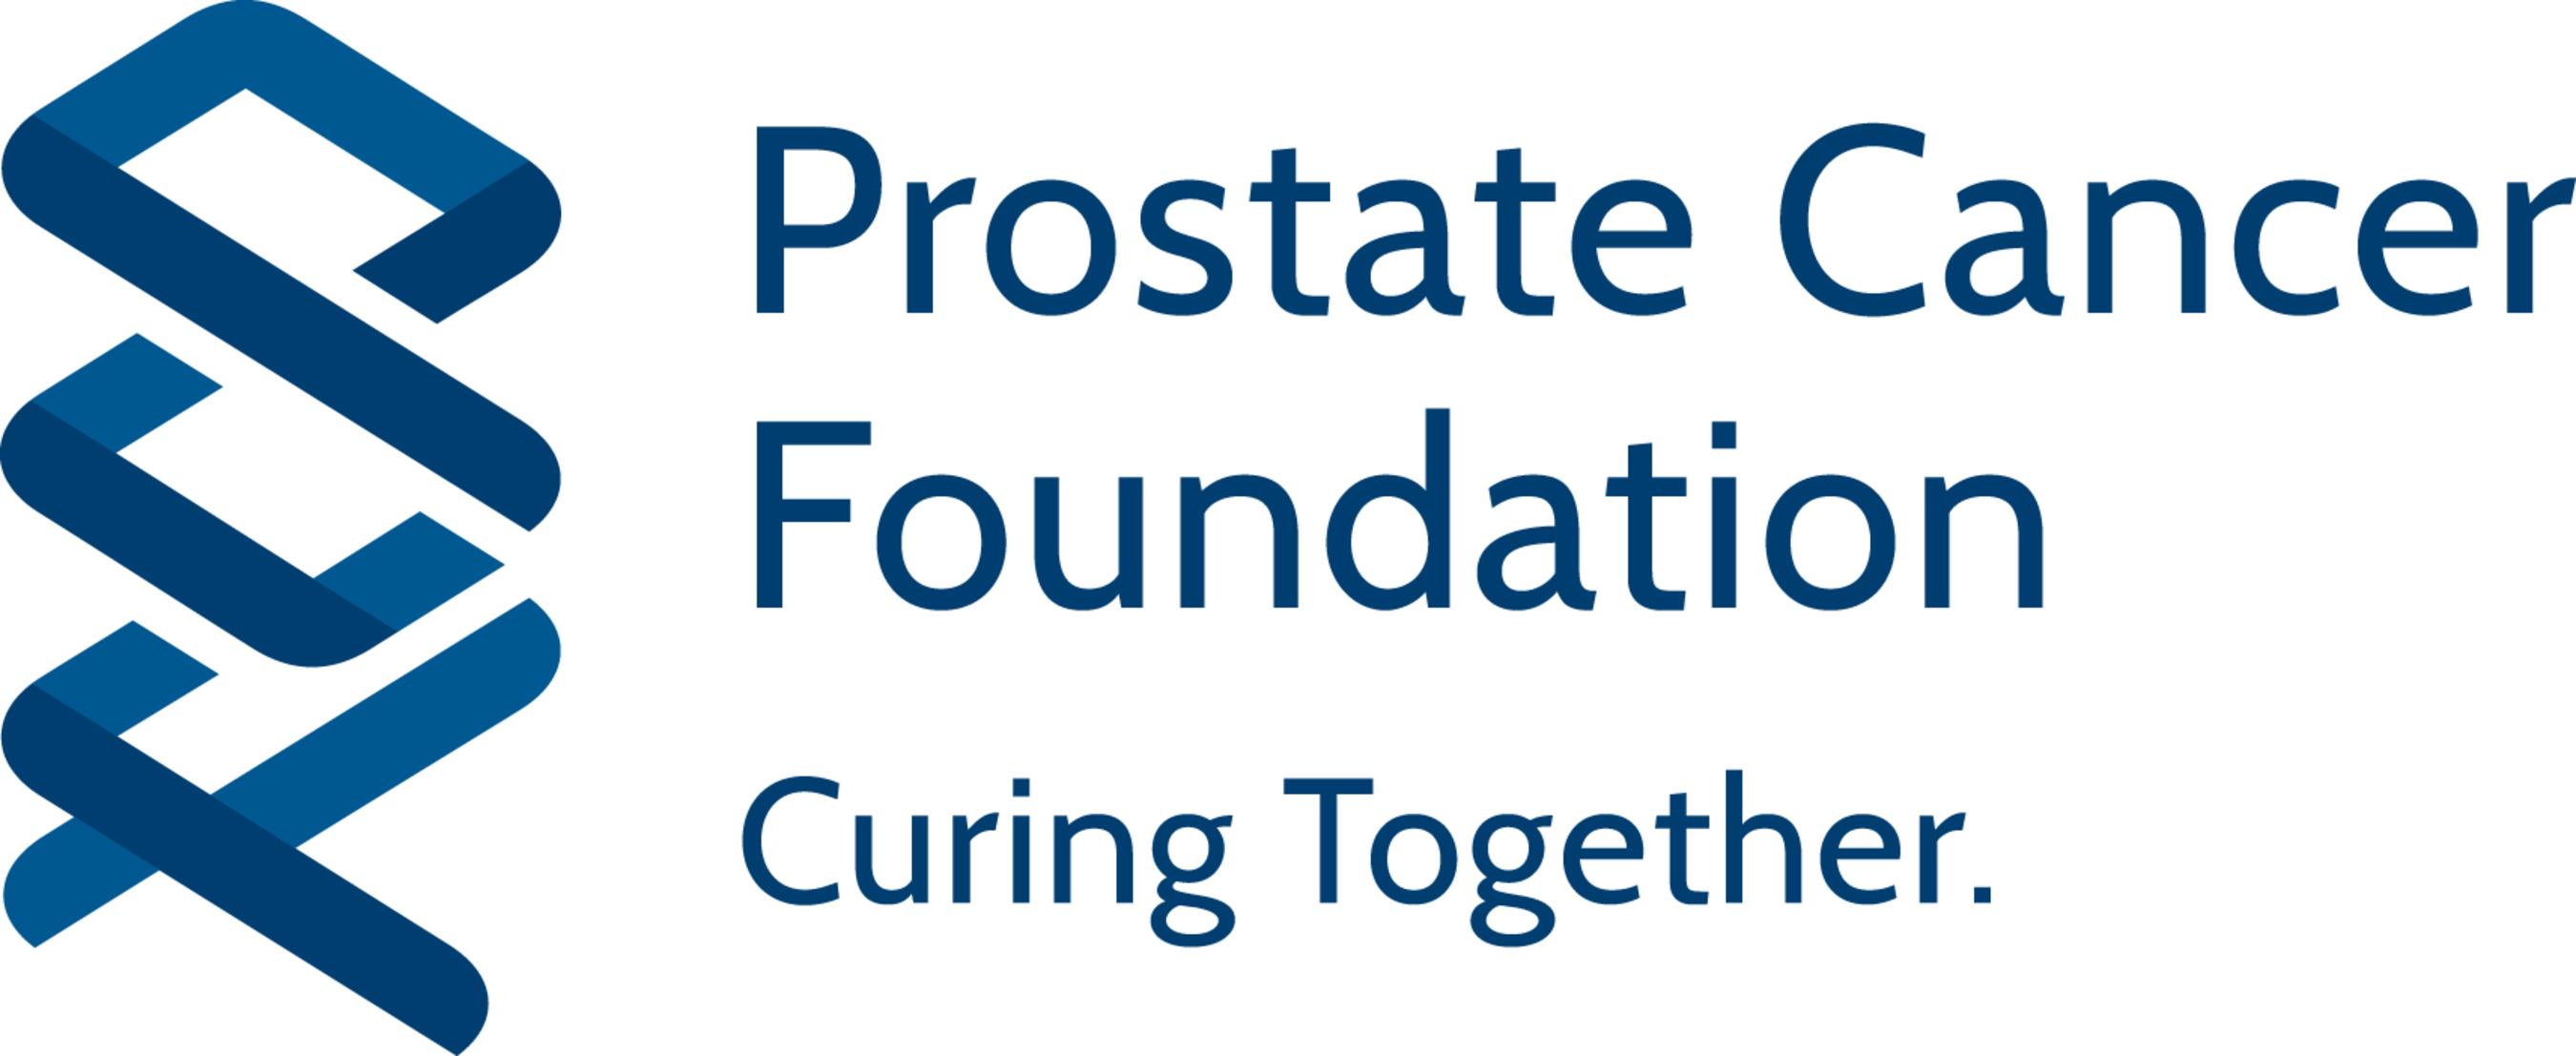 Get checked. Visit pcf.org. (PRNewsFoto/Prostate Cancer Foundation) (PRNewsFoto/Prostate Cancer Foundation)